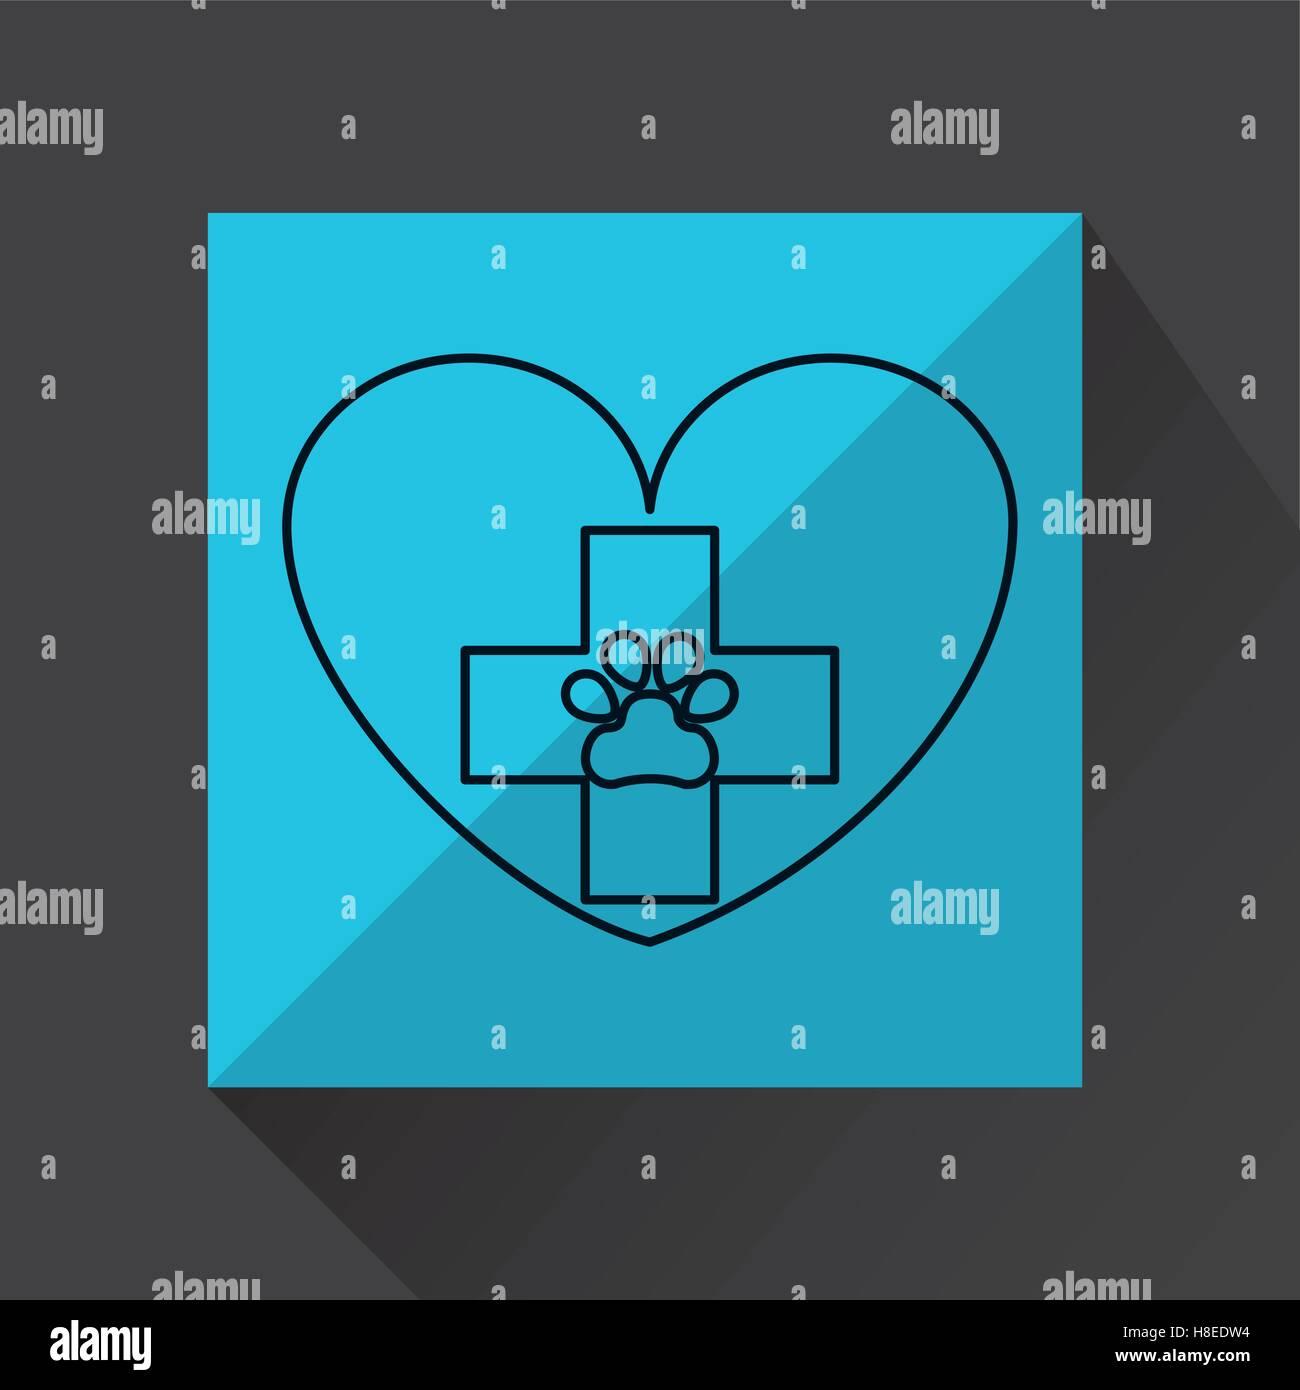 animal hospital care icon vector illustration eps 10 - Stock Image